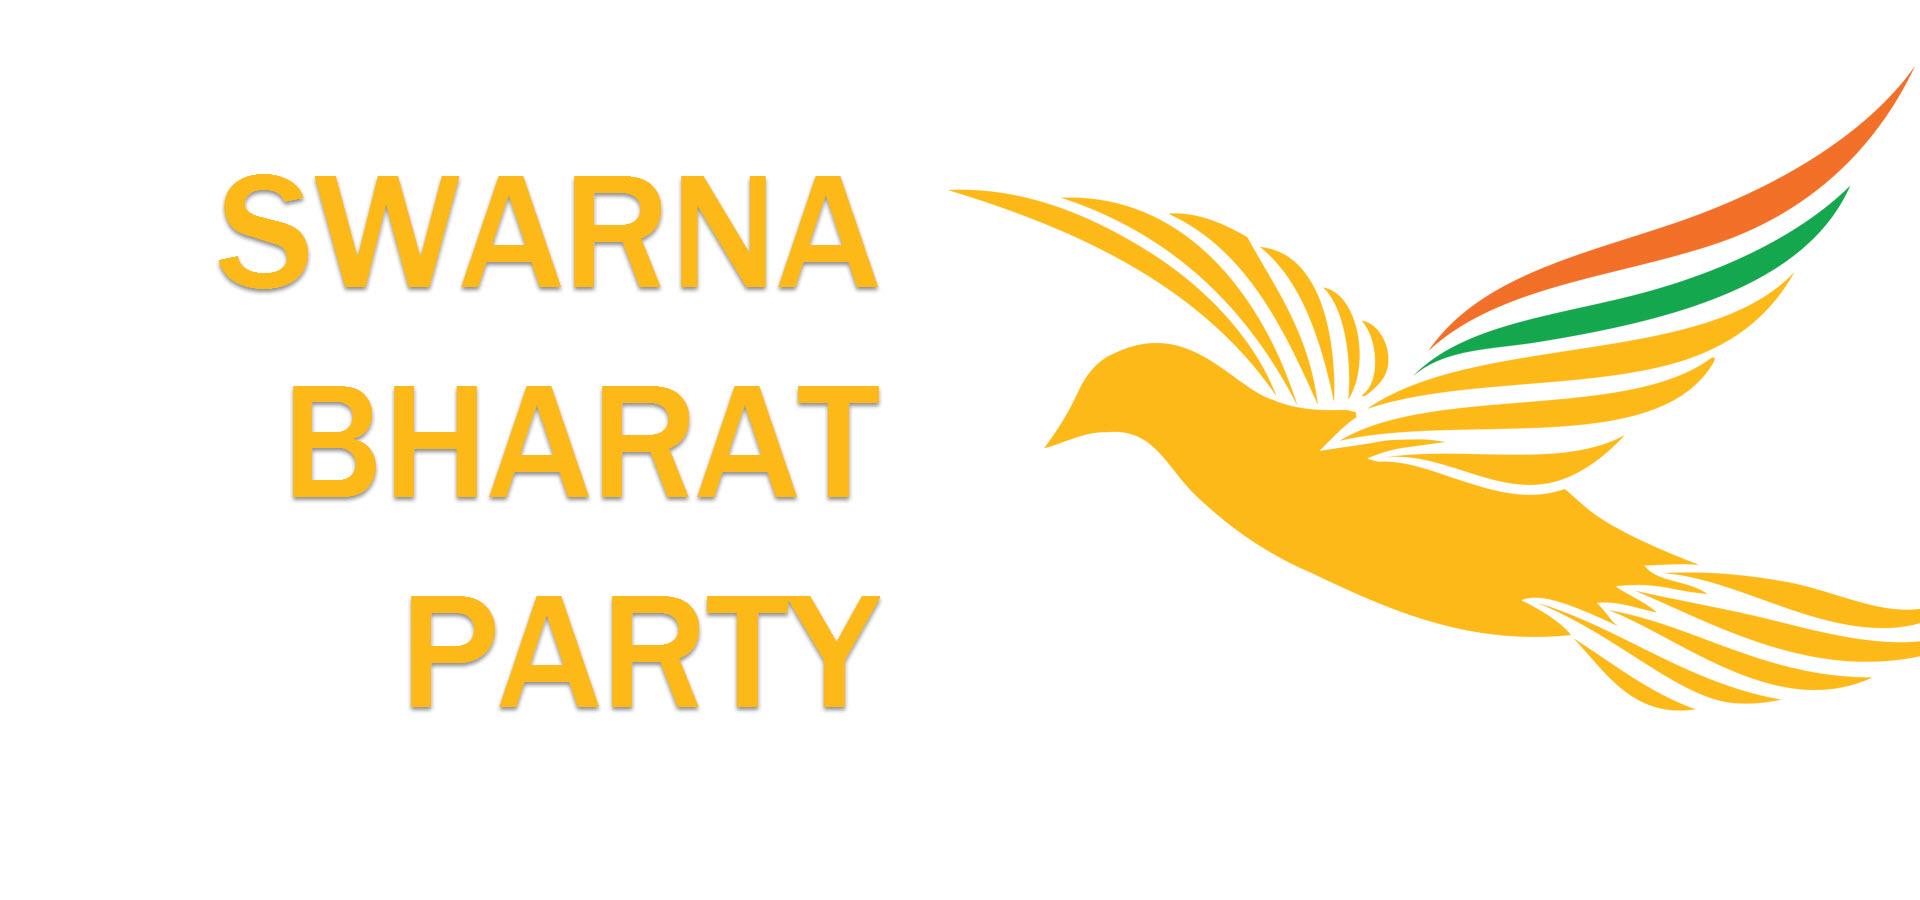 swarna bharat party home